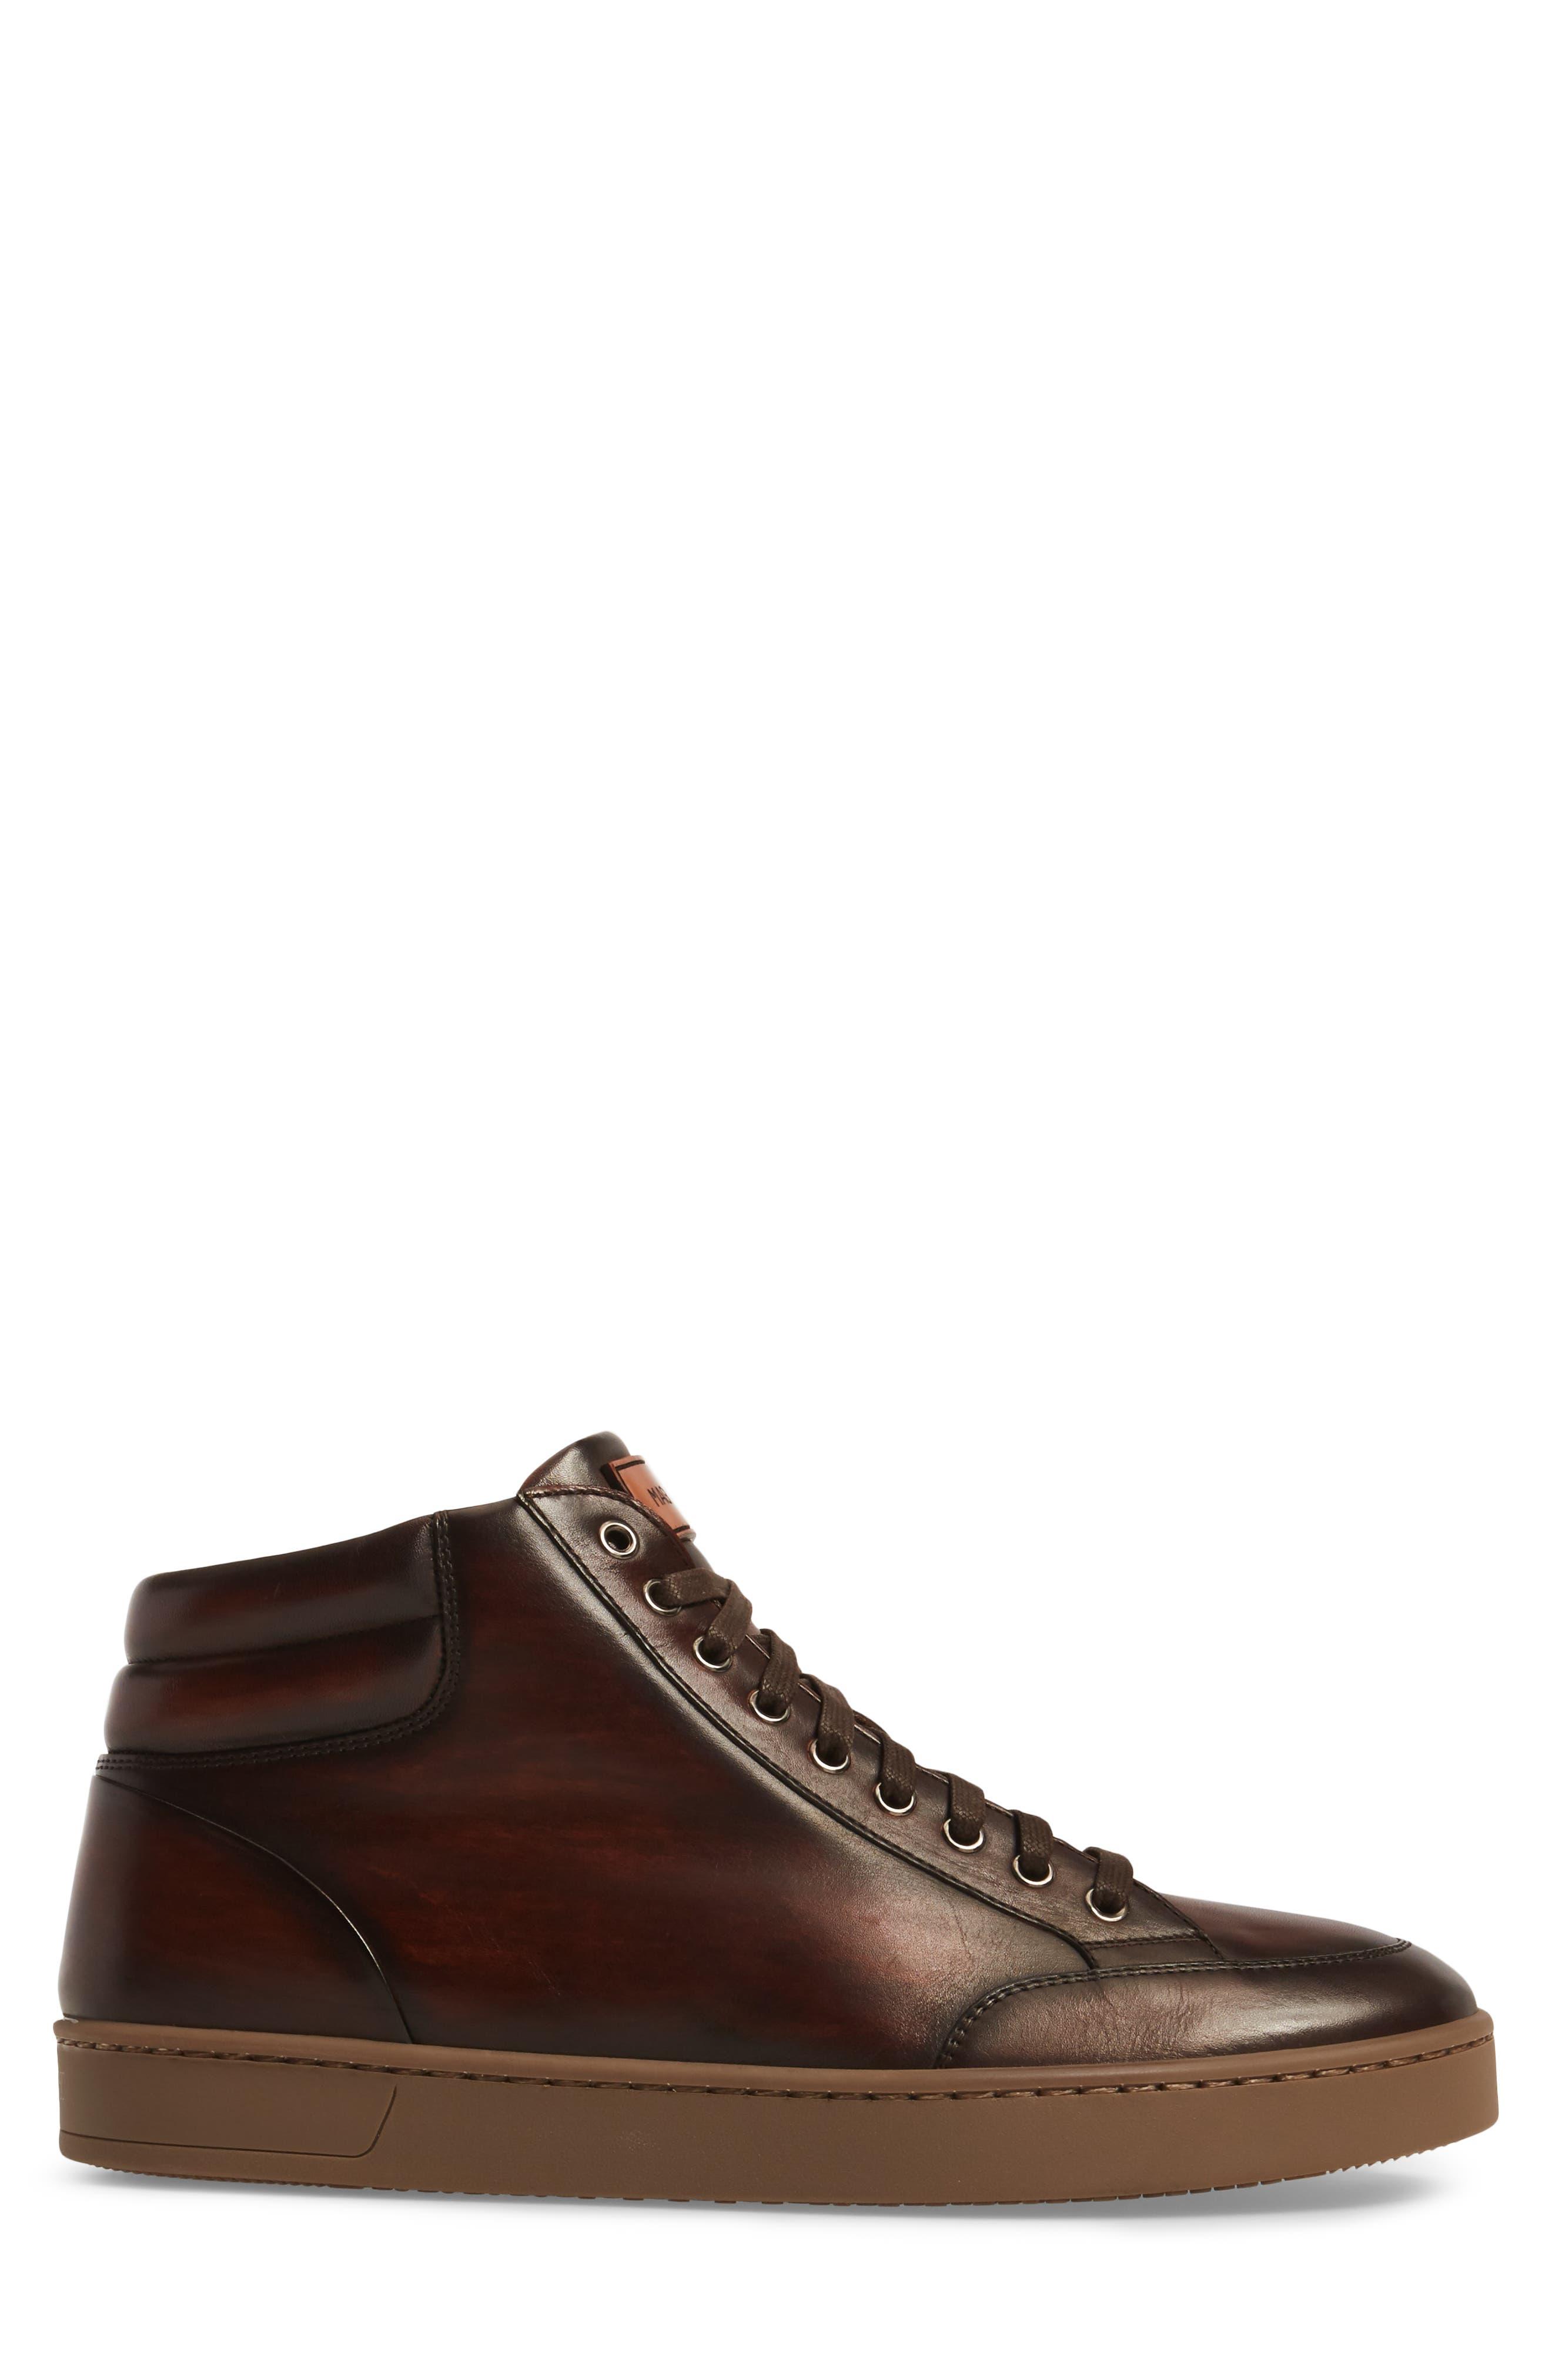 Carmel Sneaker,                             Alternate thumbnail 3, color,                             Mid Brown Leather